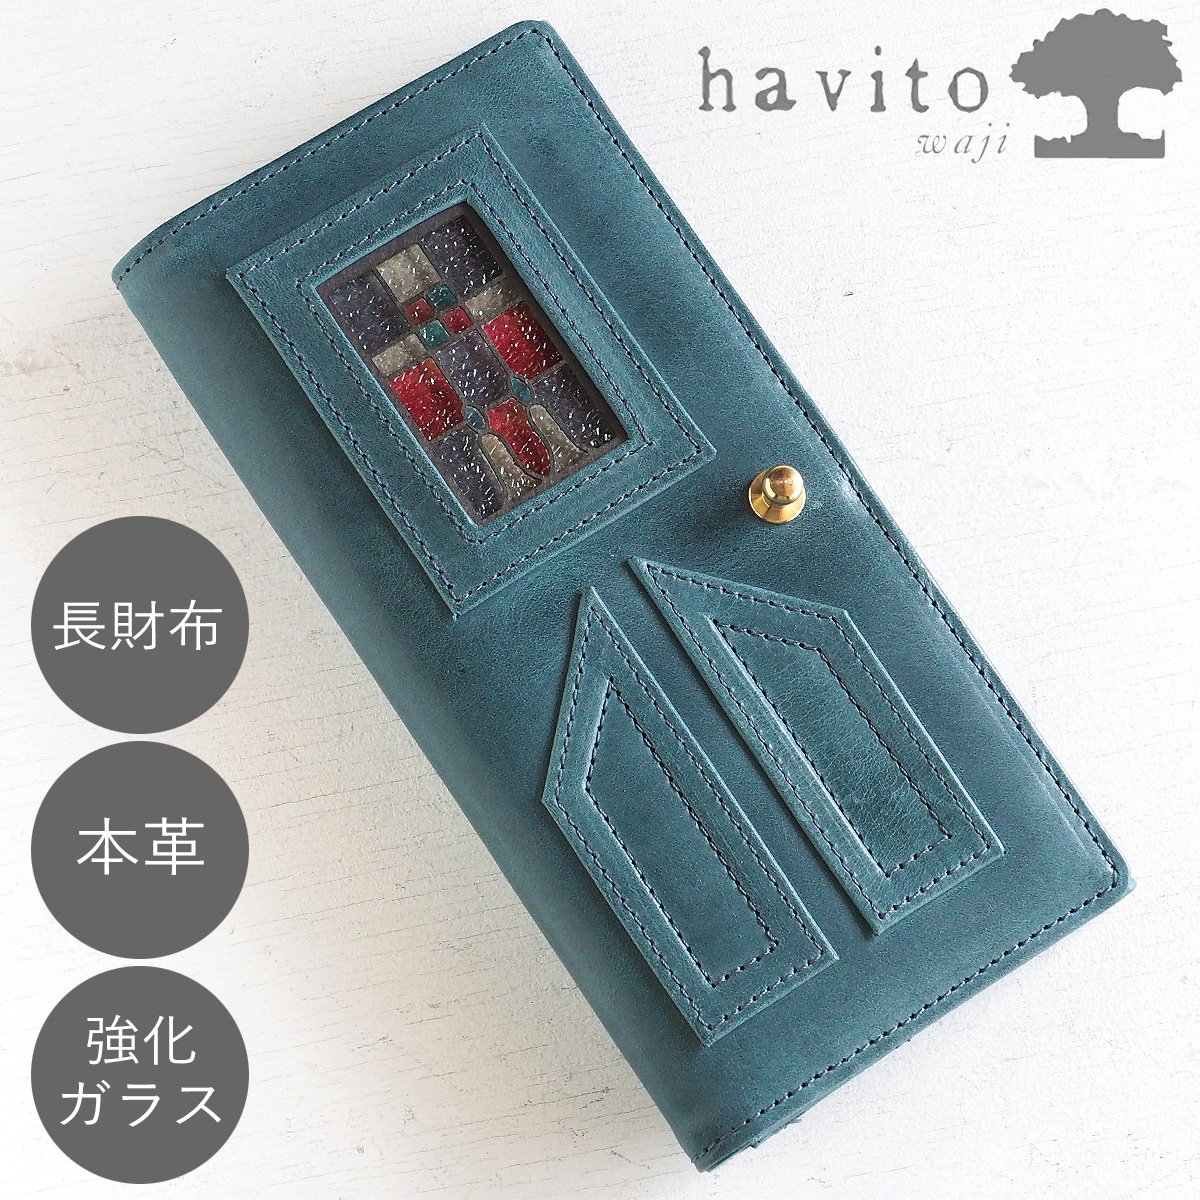 havito(ハビト) glart 長財布 デザイン硝子×オイルレザー アンティークドア ネイビー [H0202-NV]